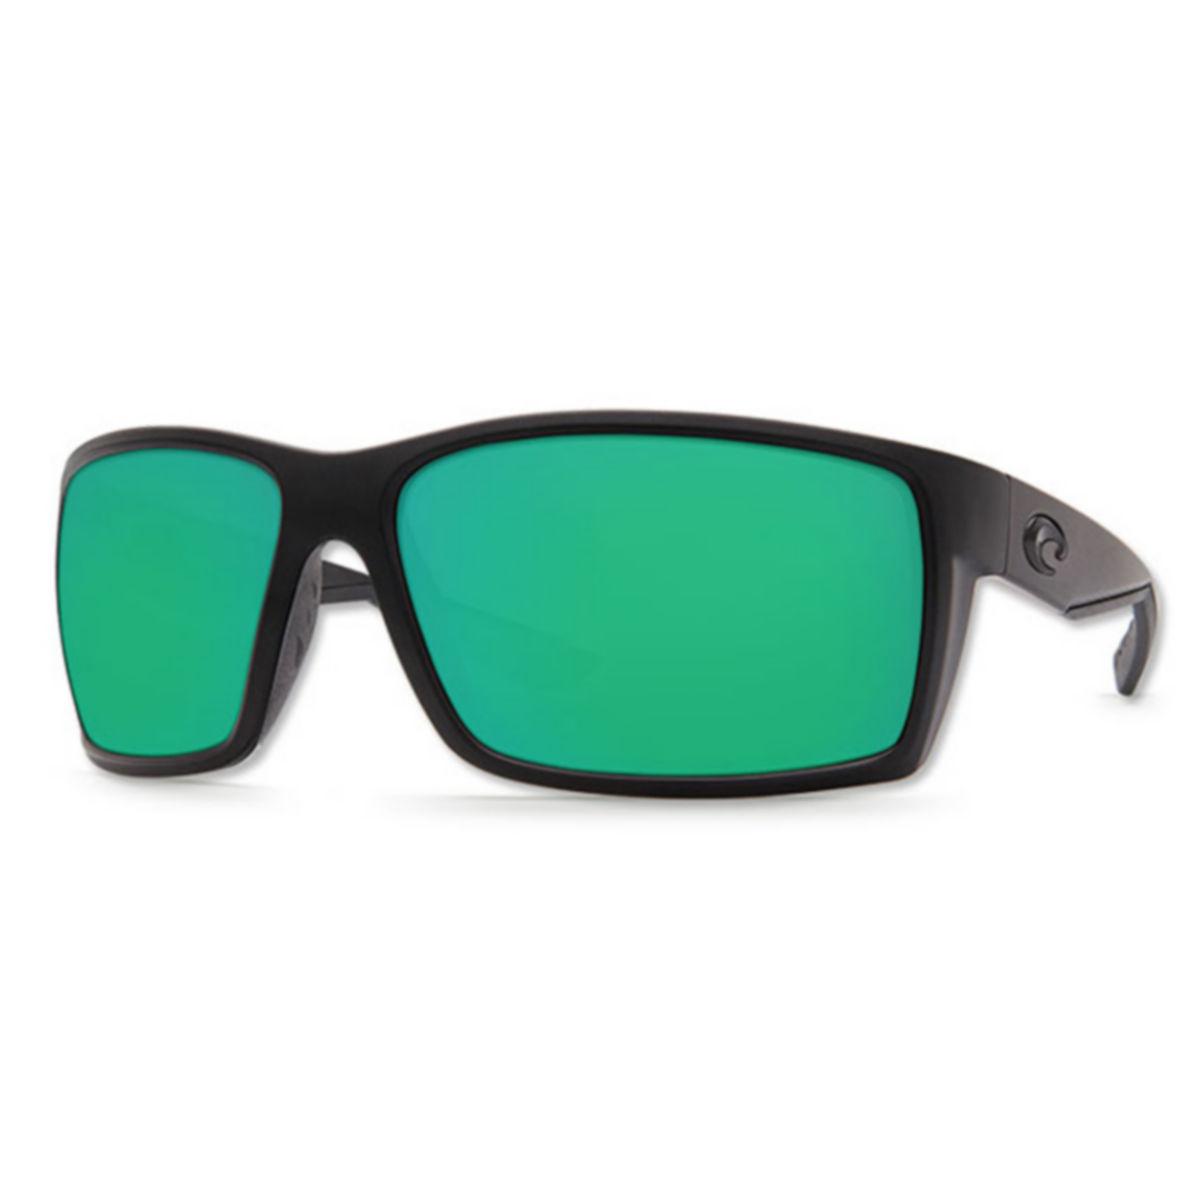 Costa Reefton Sunglasses - image number 0